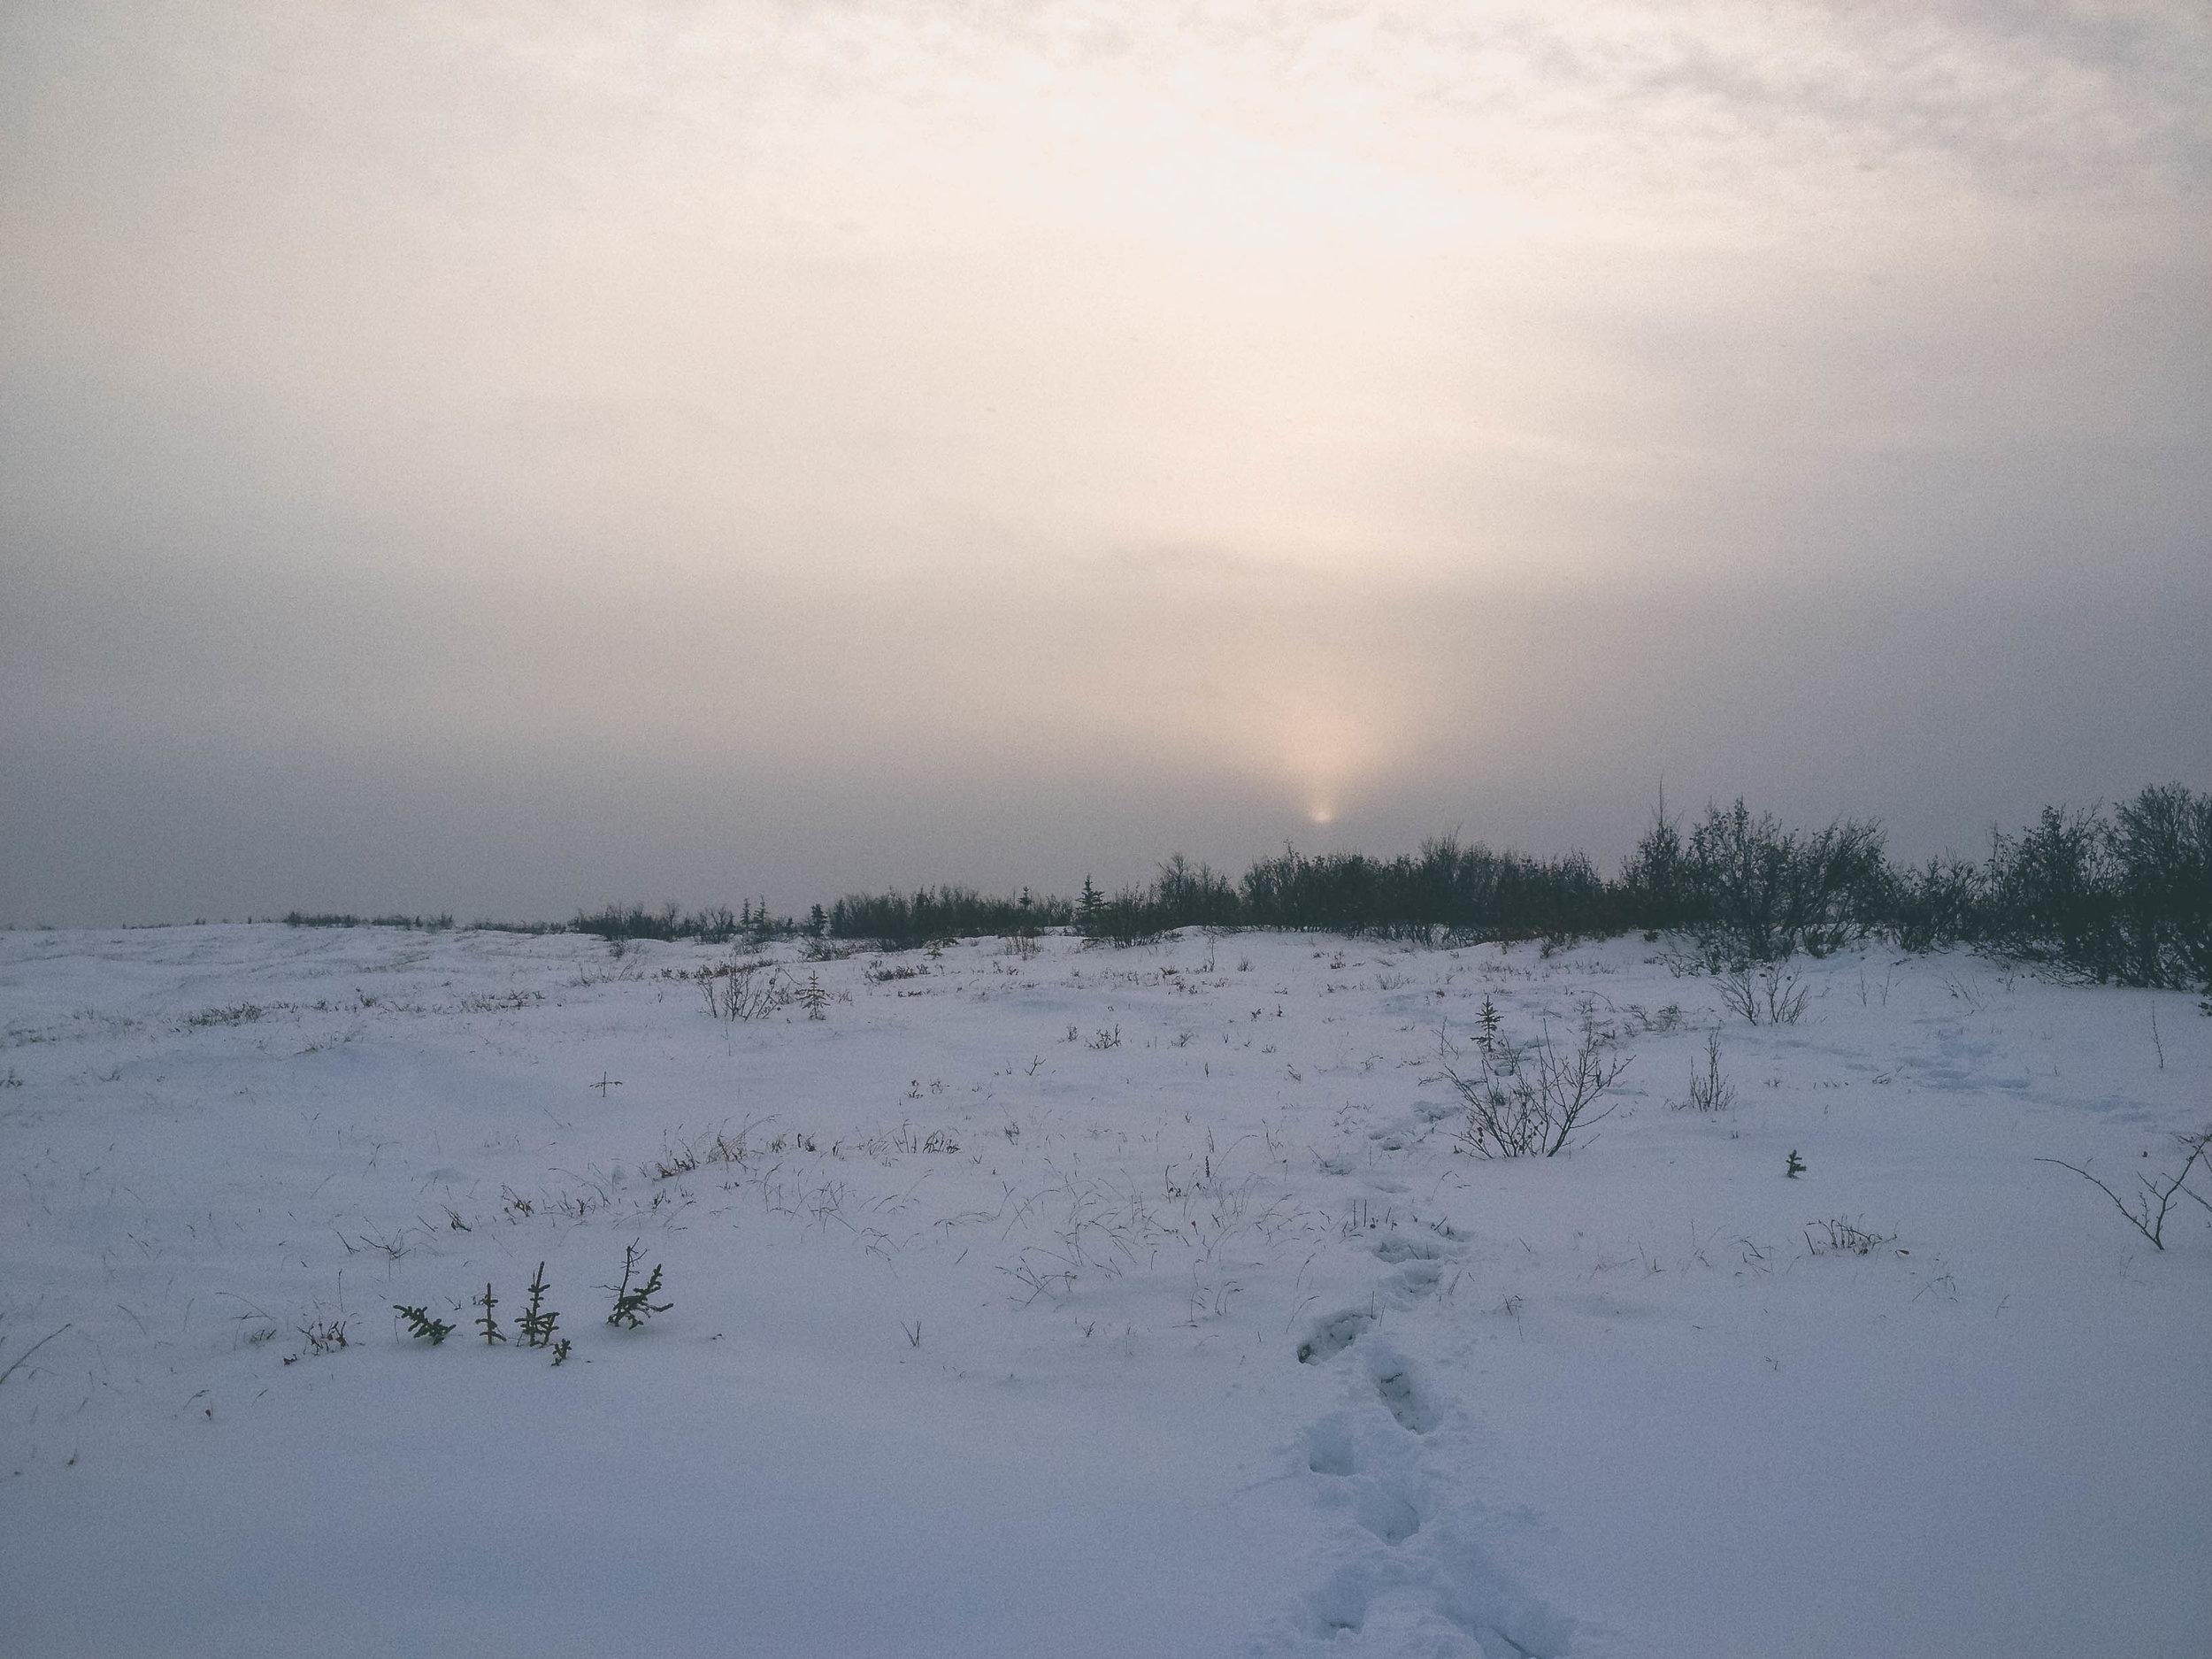 Fairbanks, Alaska. November 2012